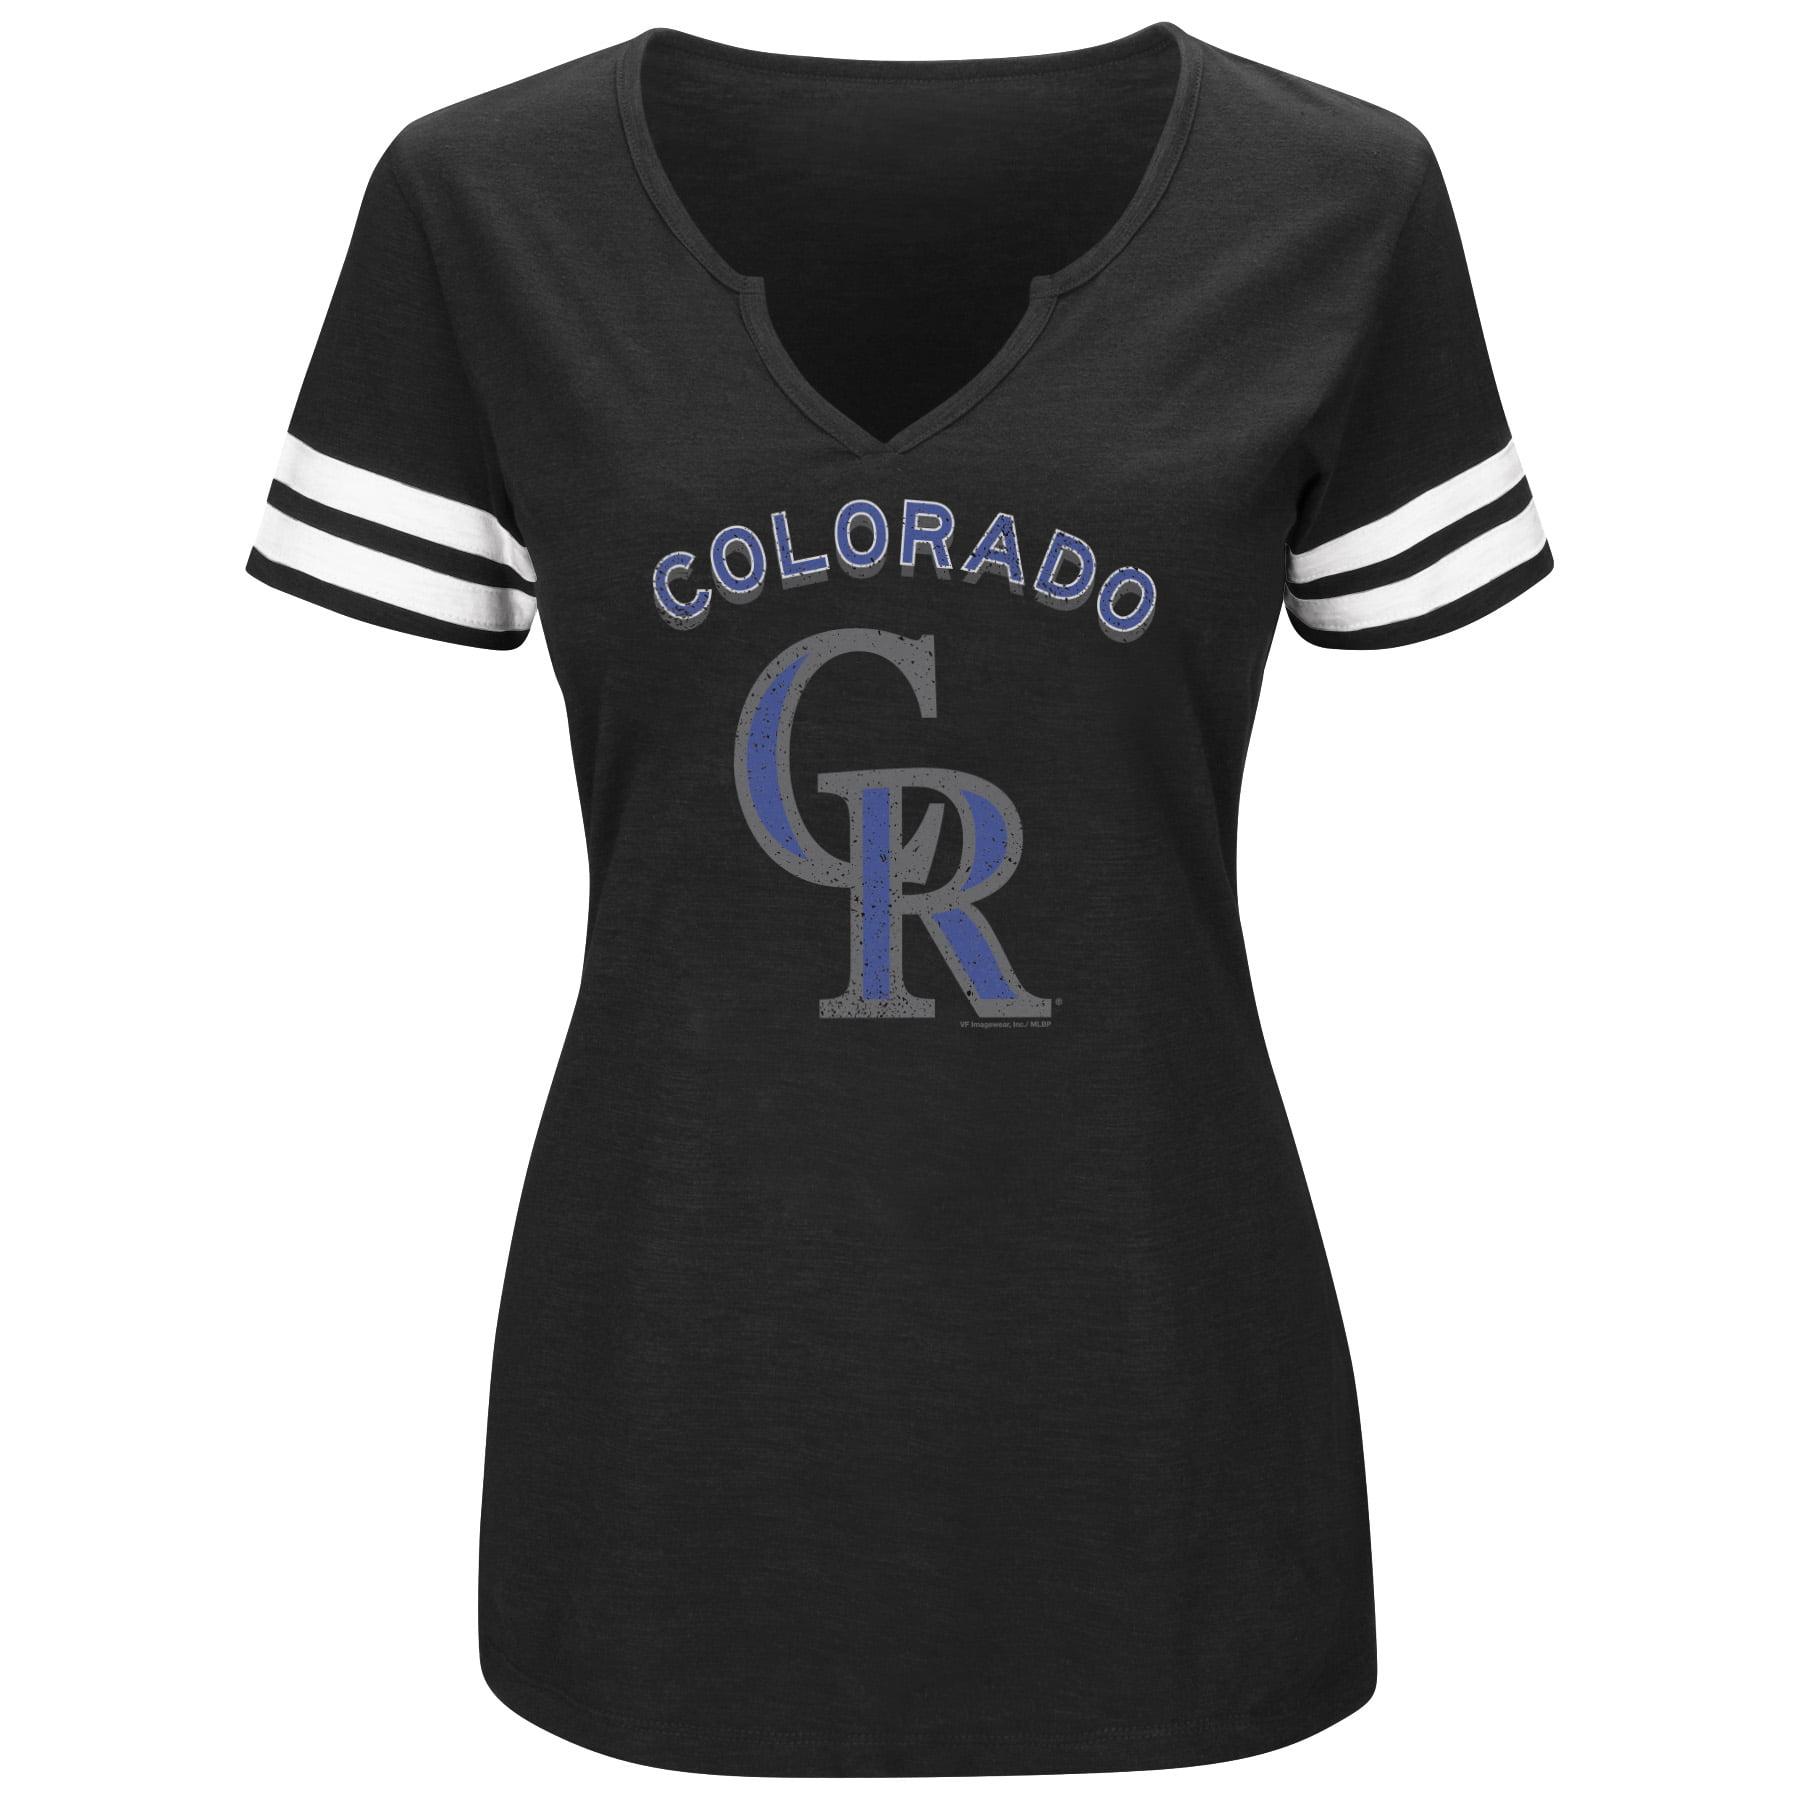 Women's Majestic Black/White Colorado Rockies Decisive Moment V-Notch T-Shirt